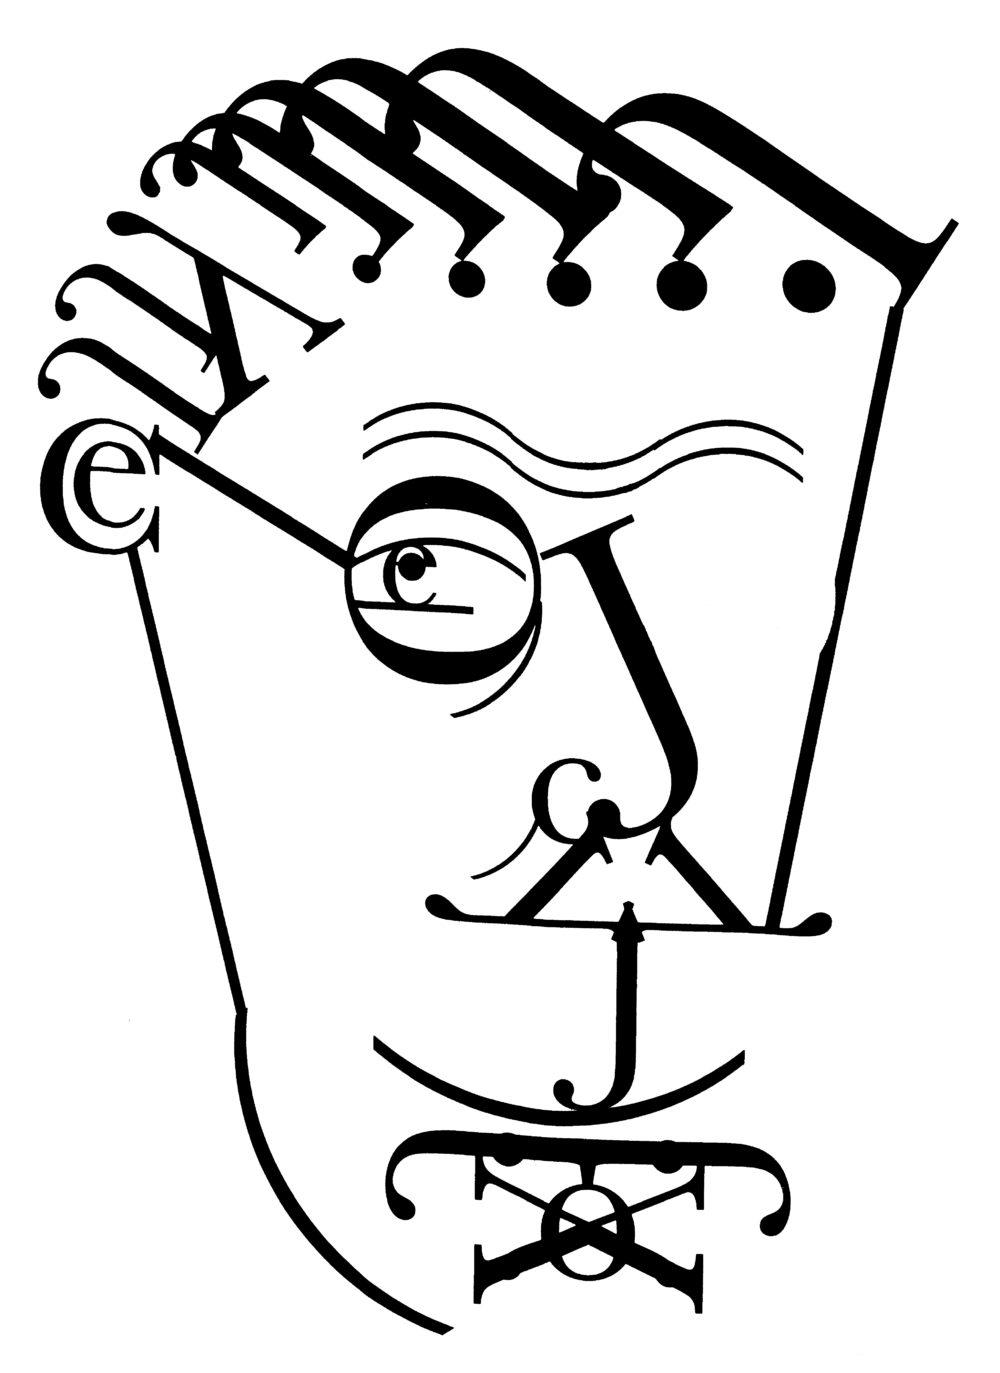 Gordon Bowker on James Joyce, Slightly Foxed Issue 42